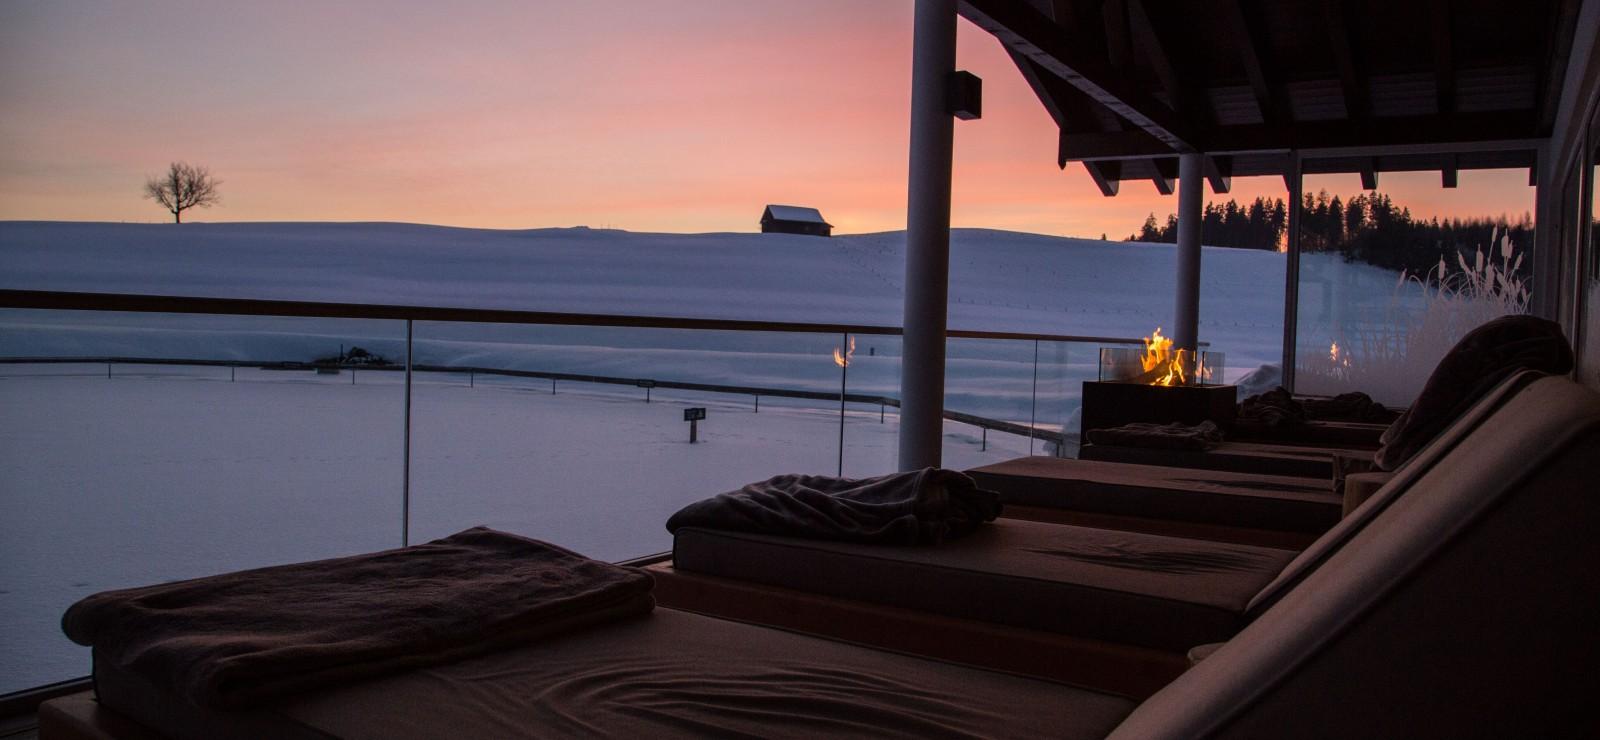 wellnesshotels bad waldsee baden w rttemberg bewertungen f r wellness hotels. Black Bedroom Furniture Sets. Home Design Ideas